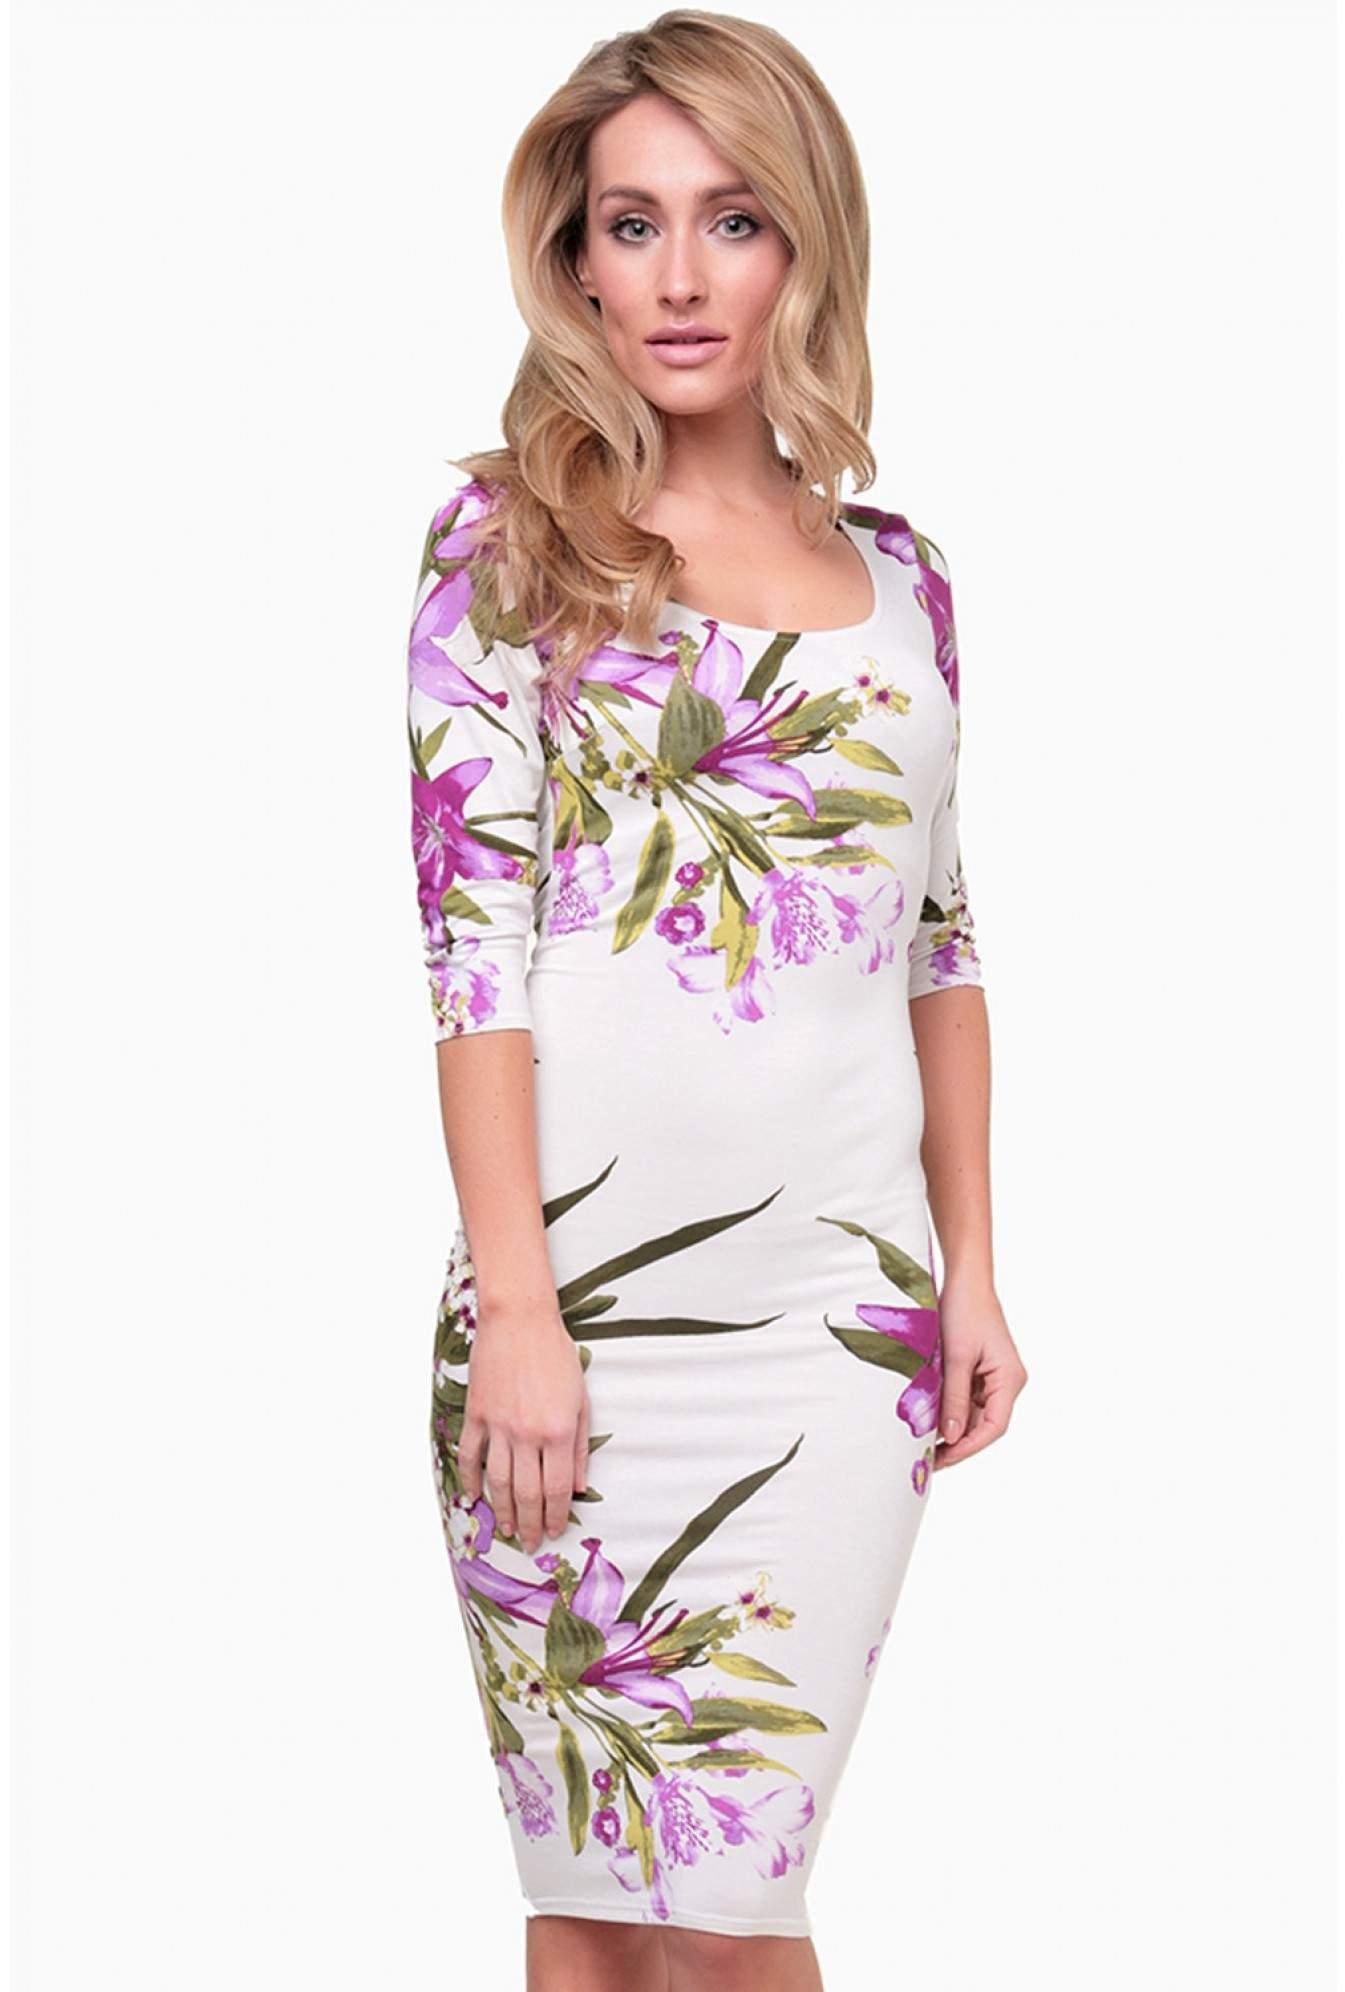 794d6536e61 Purple Floral Print Bodycon Dress